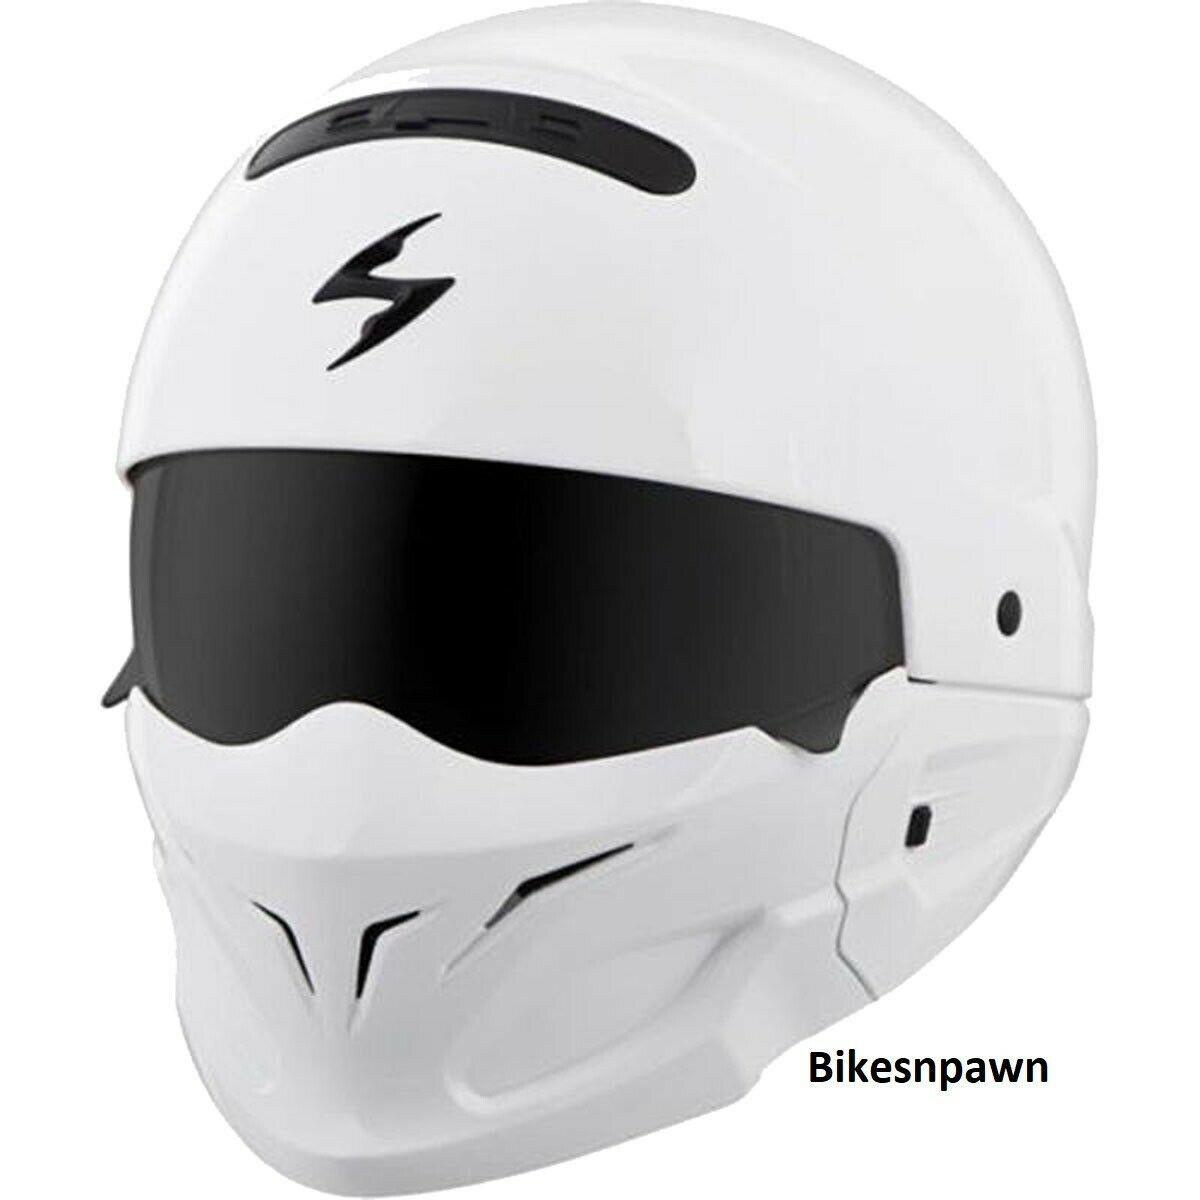 New Size 3XL Scorpion EXO Covert White 3 in 1 Motorcycle Helmet DOT